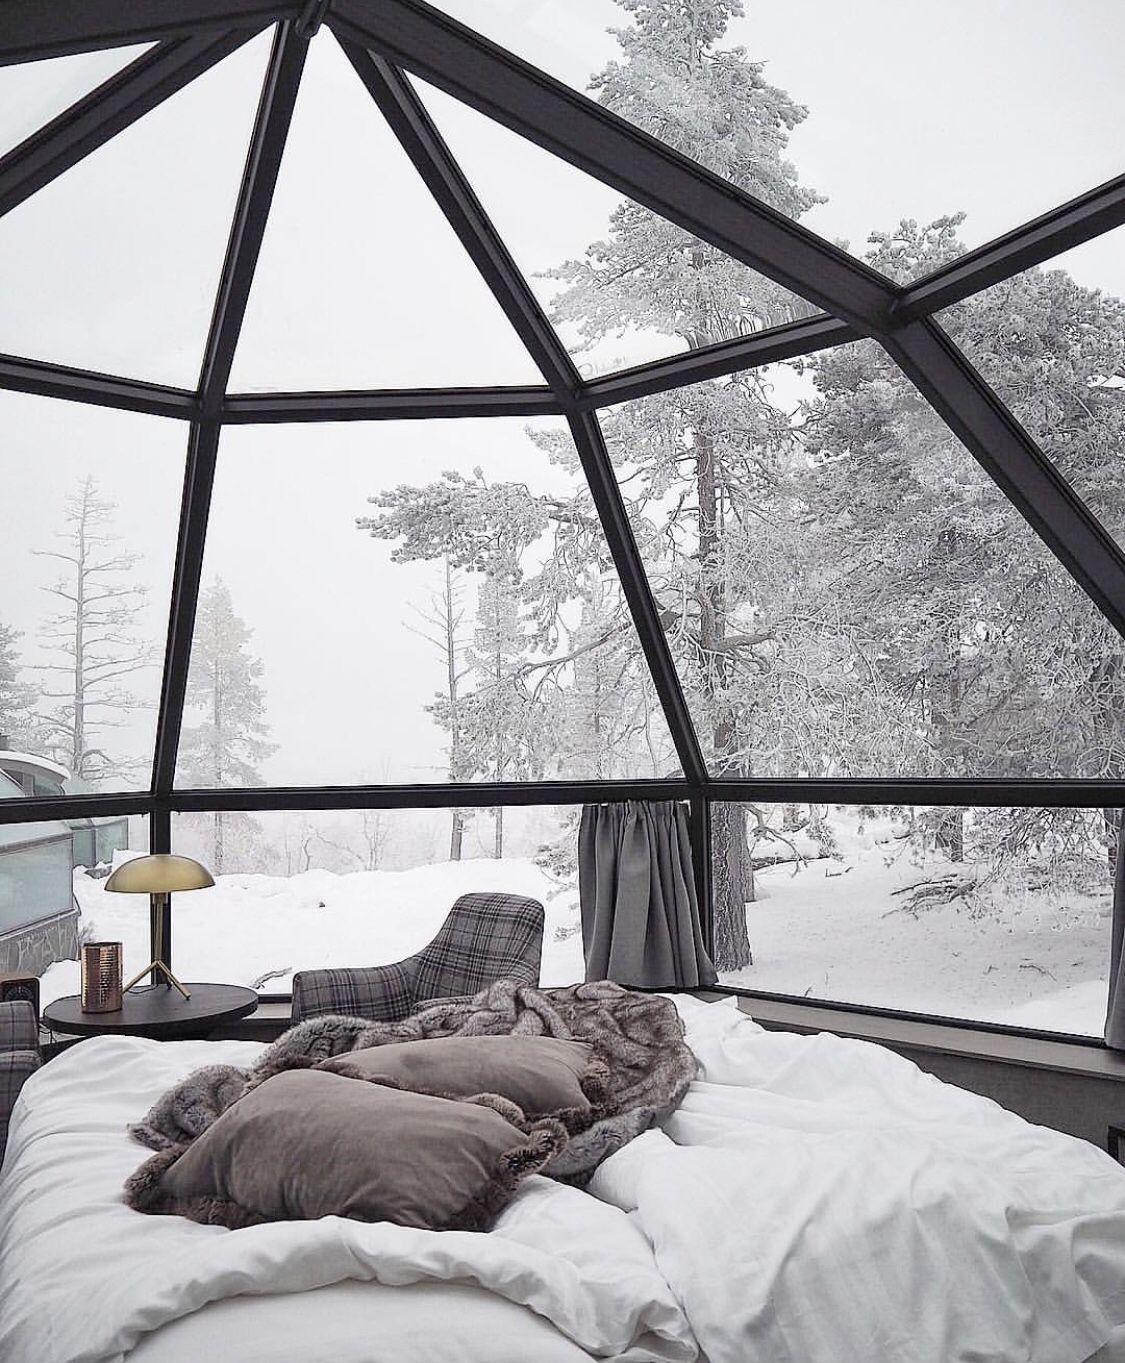 Pin By Kelly Rains Hesler On Retreat 2 Sleep Dream Rooms